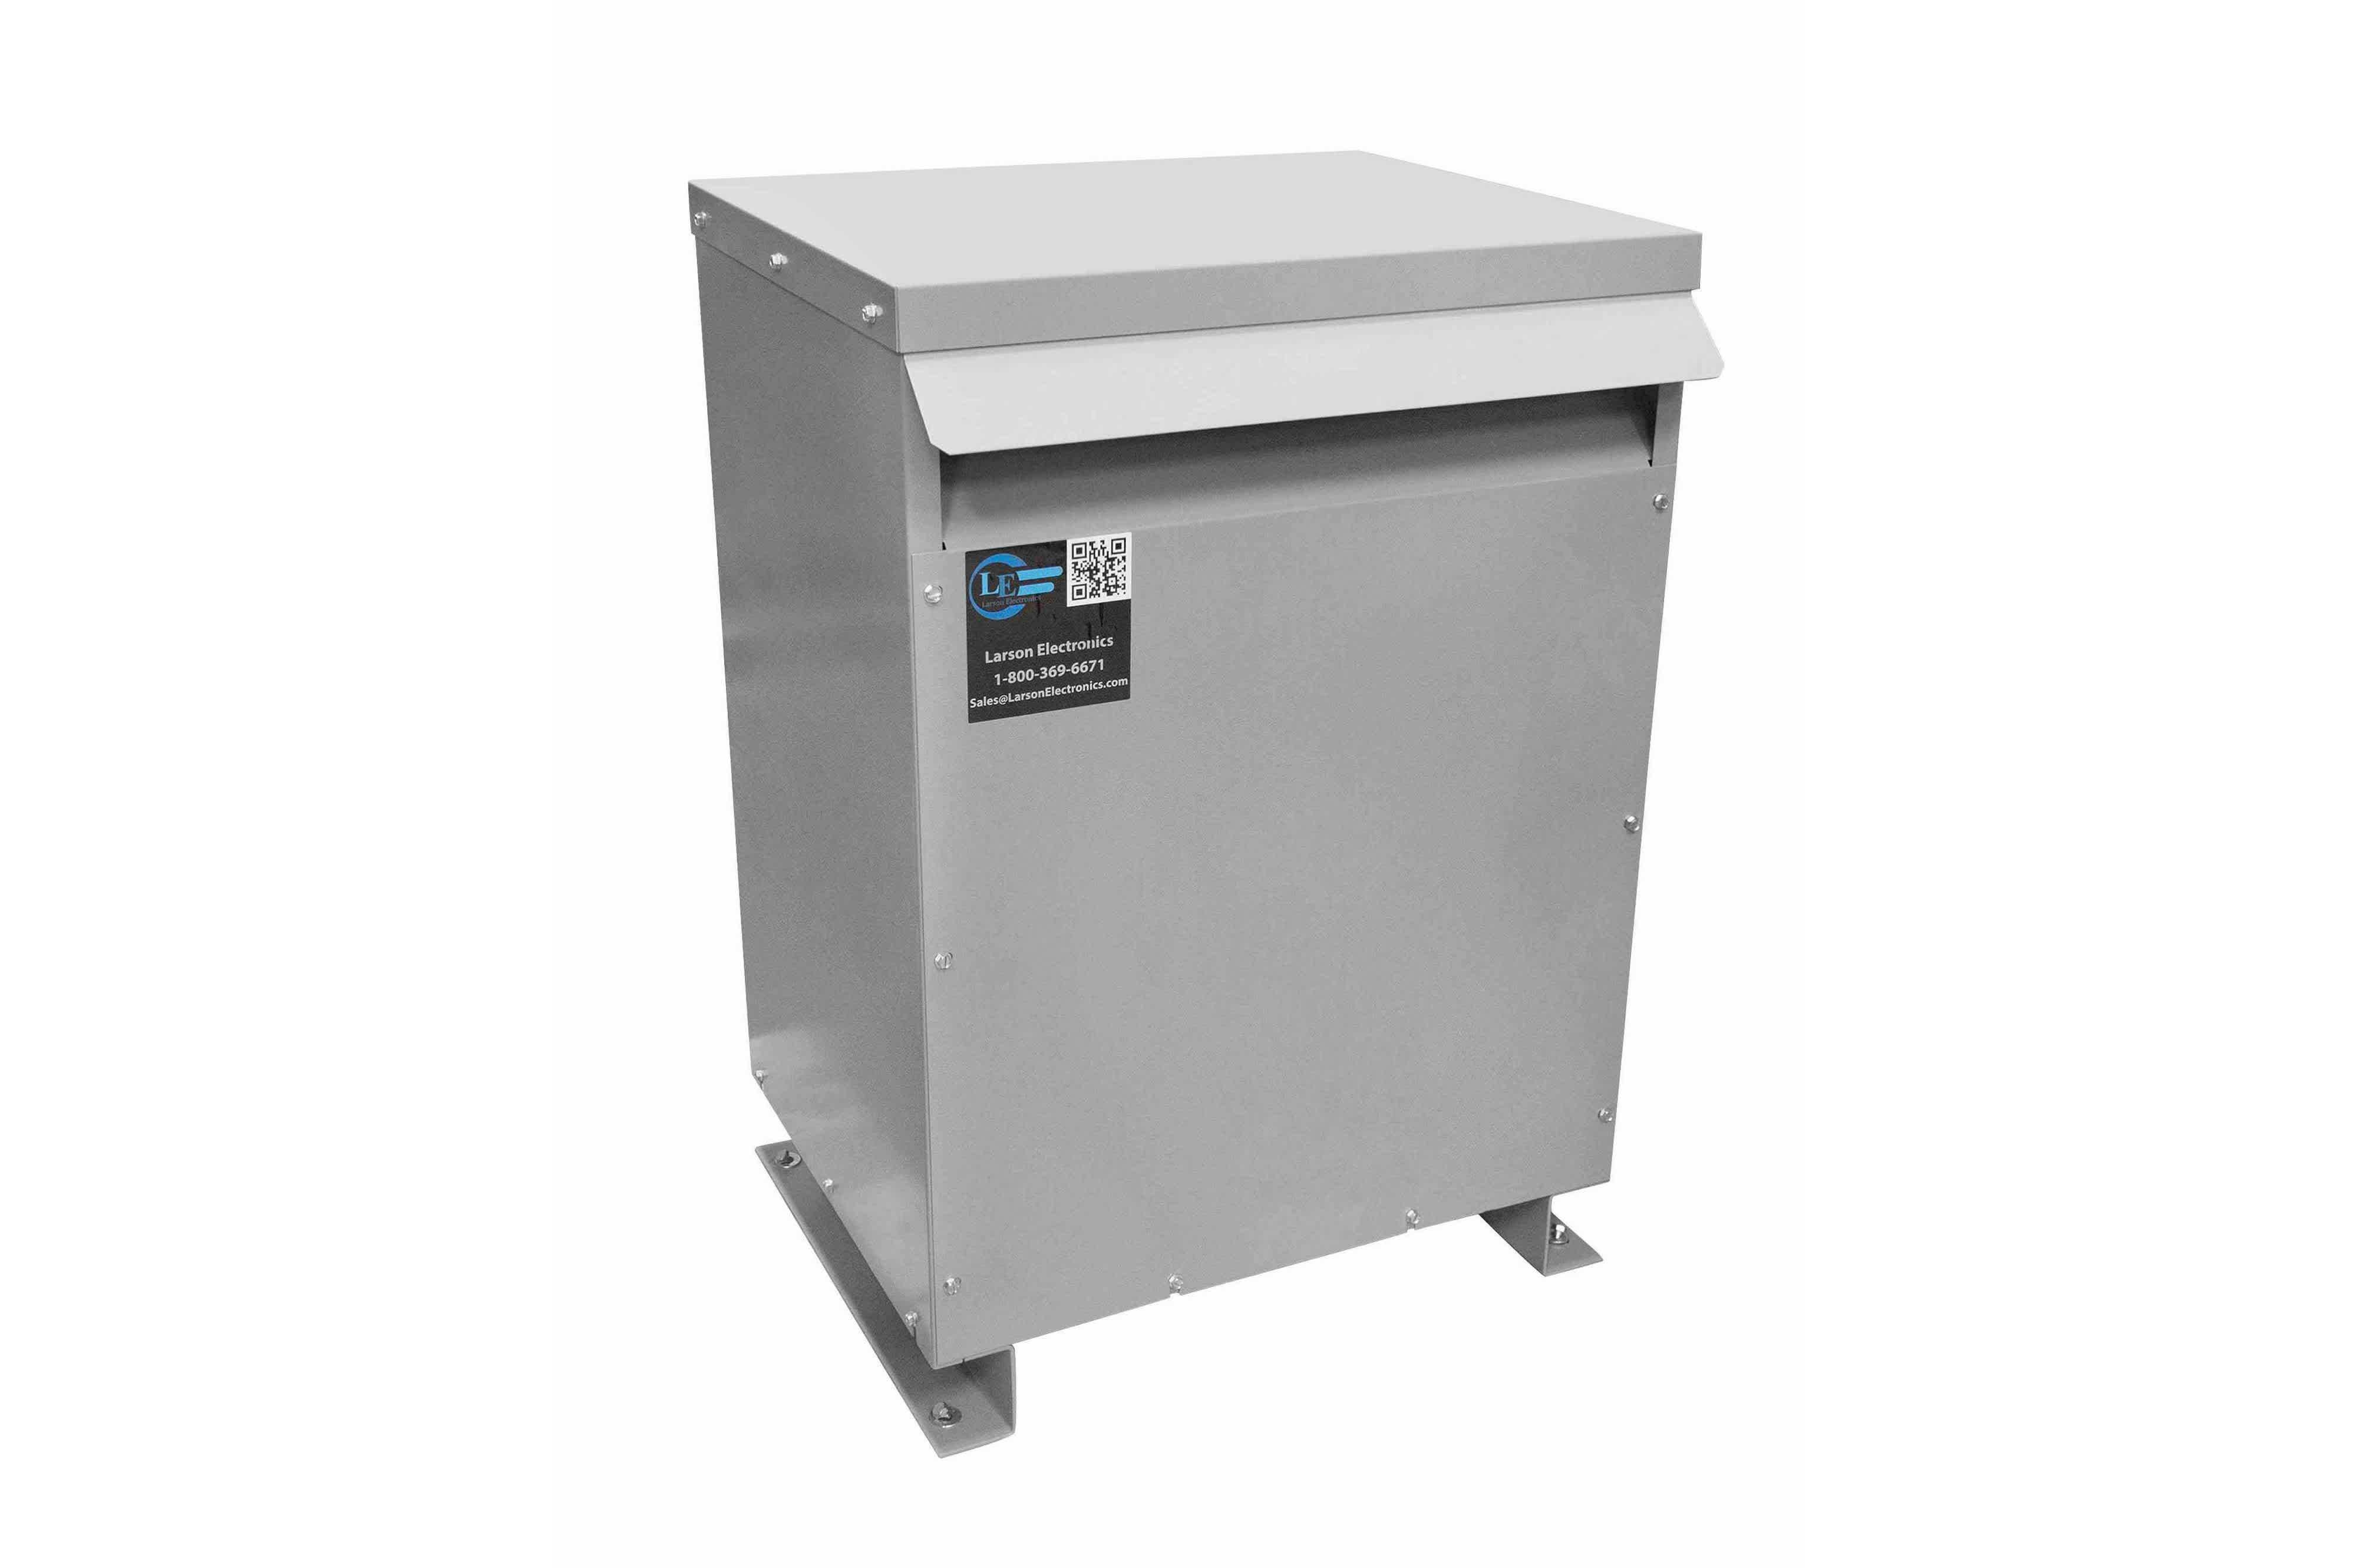 15 kVA 3PH Isolation Transformer, 240V Wye Primary, 415V Delta Secondary, N3R, Ventilated, 60 Hz